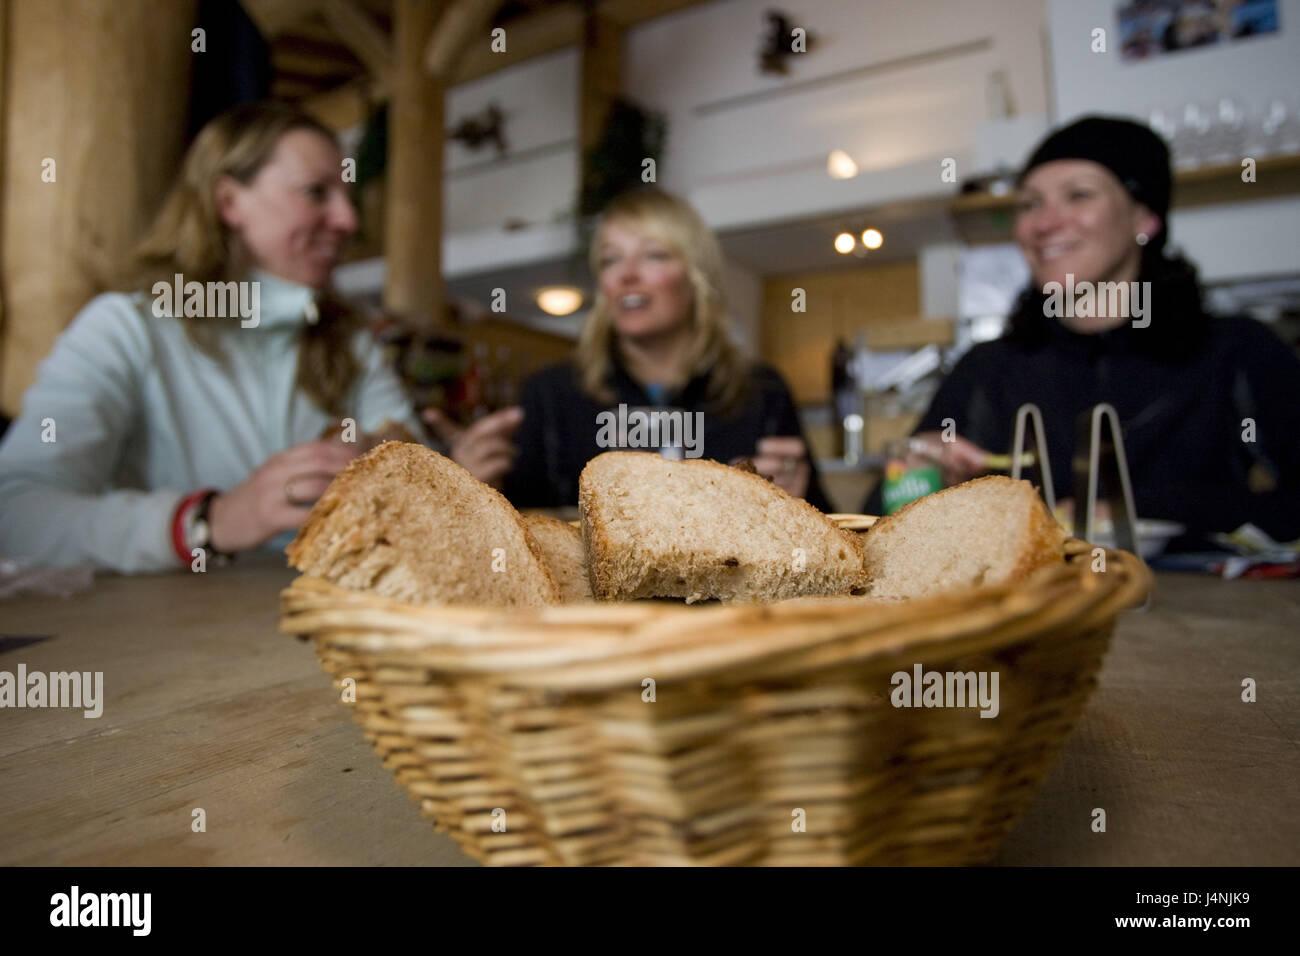 Ski steelworks, women, smile, entertainment, bread basket, blur, - Stock Image